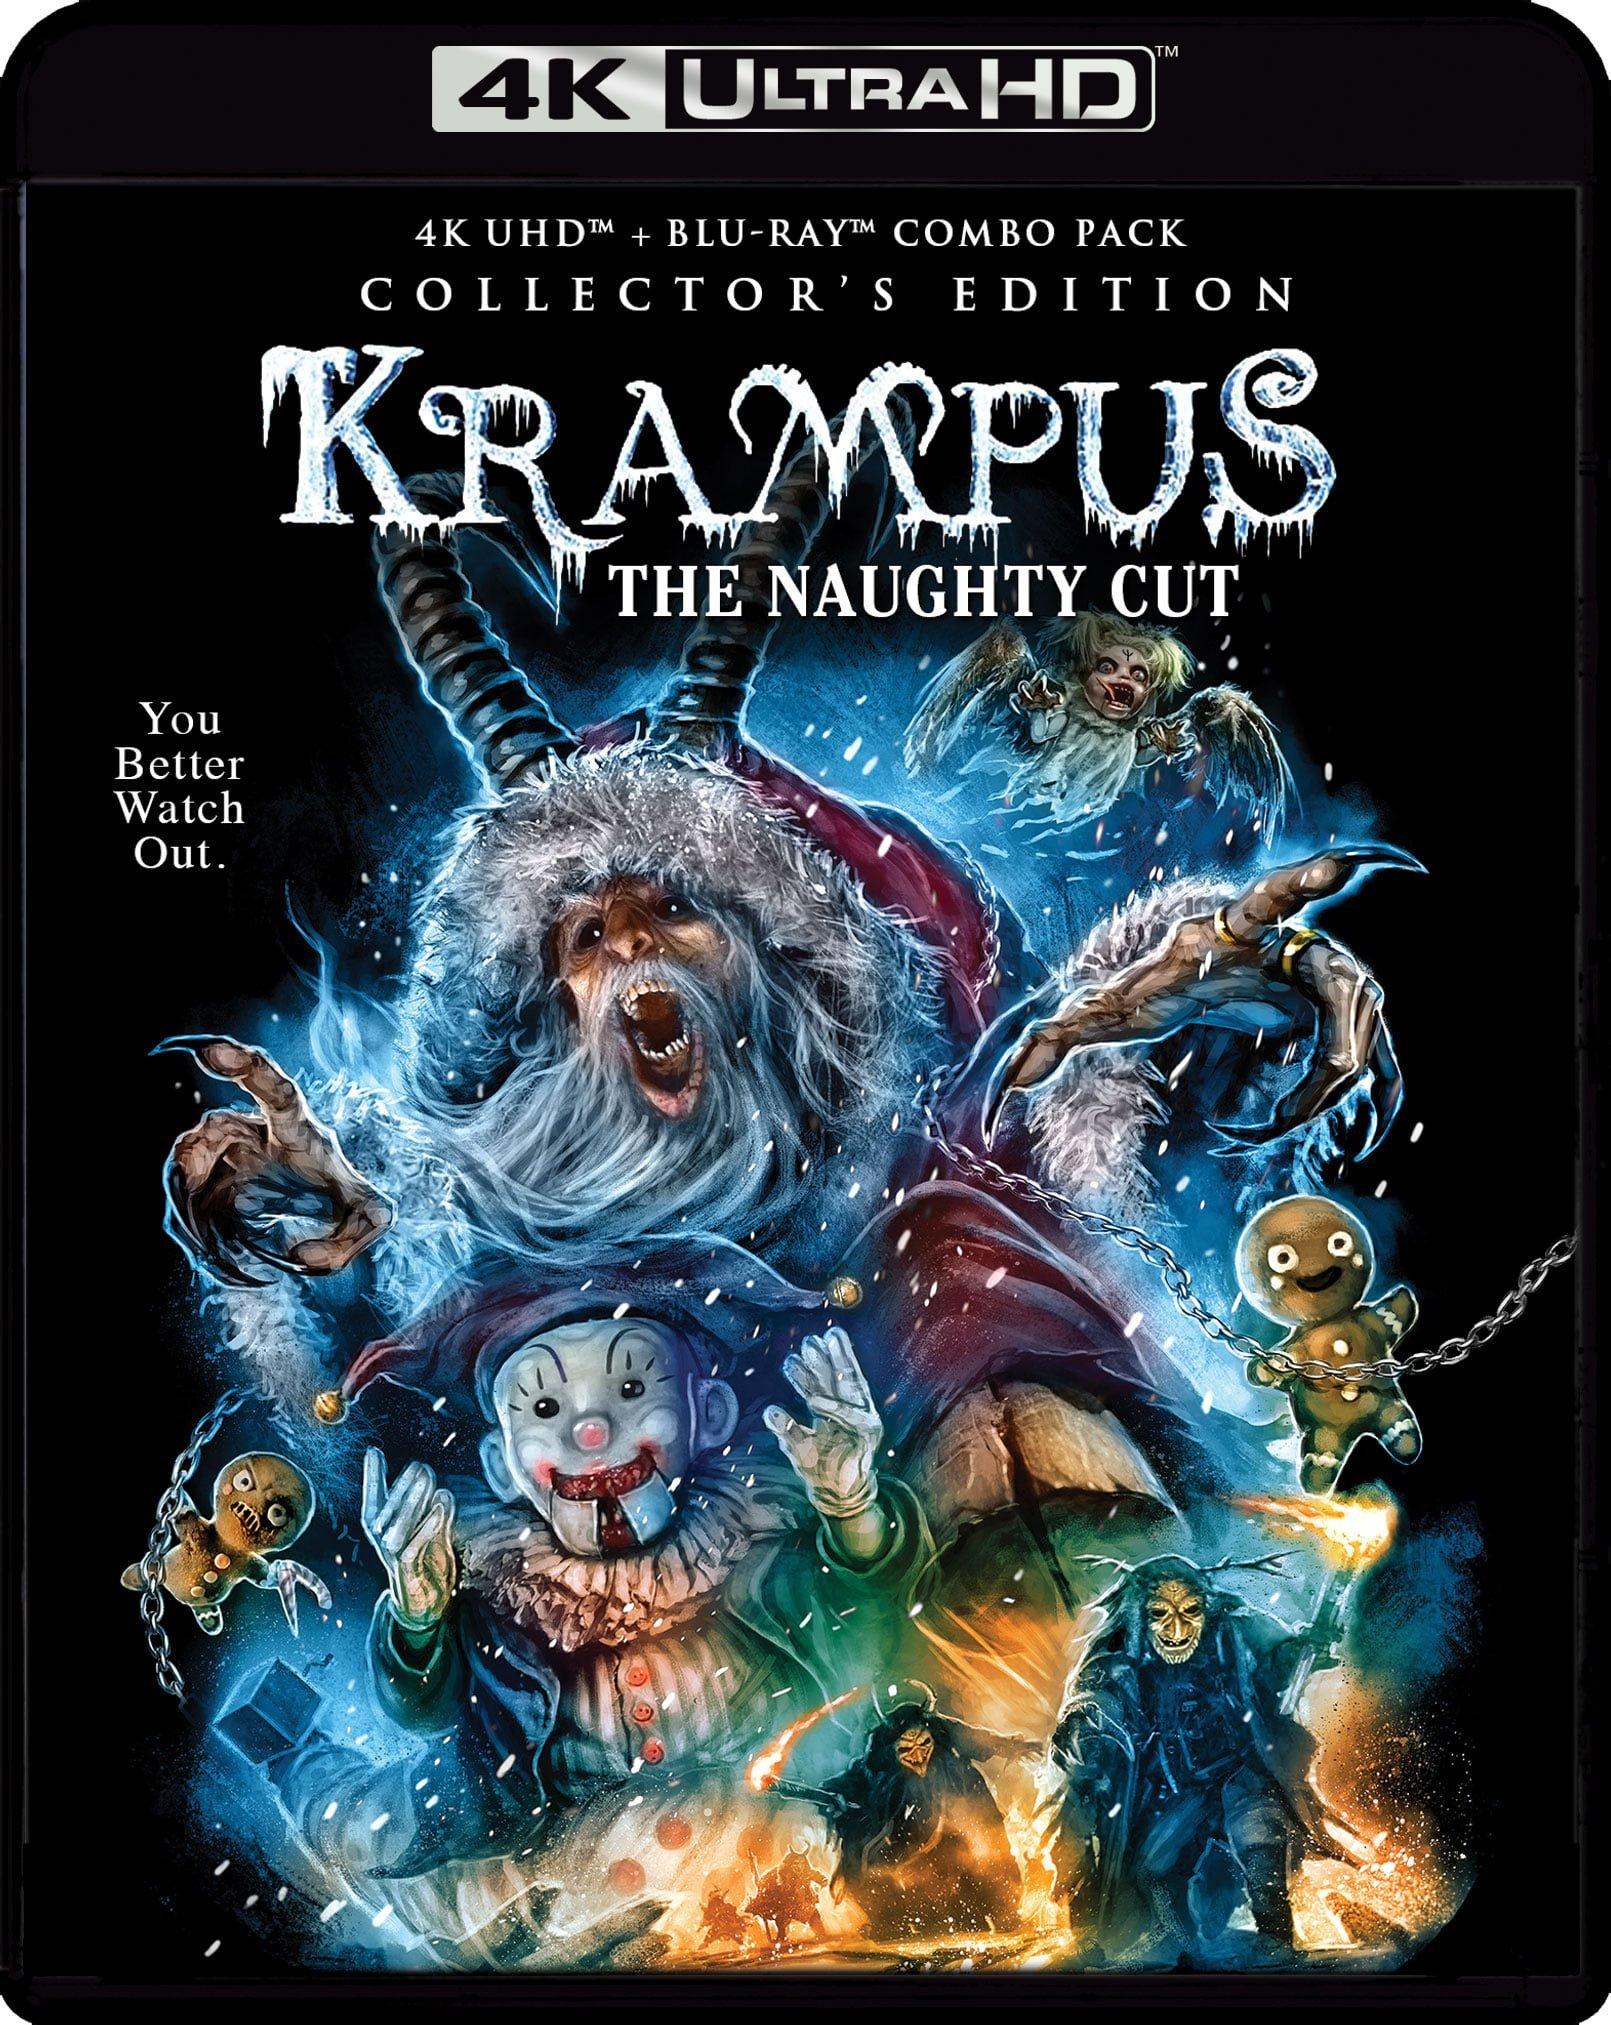 KRAMPUS HEADED TO 4K BLU-RAY FROM SCREAM FACTORY